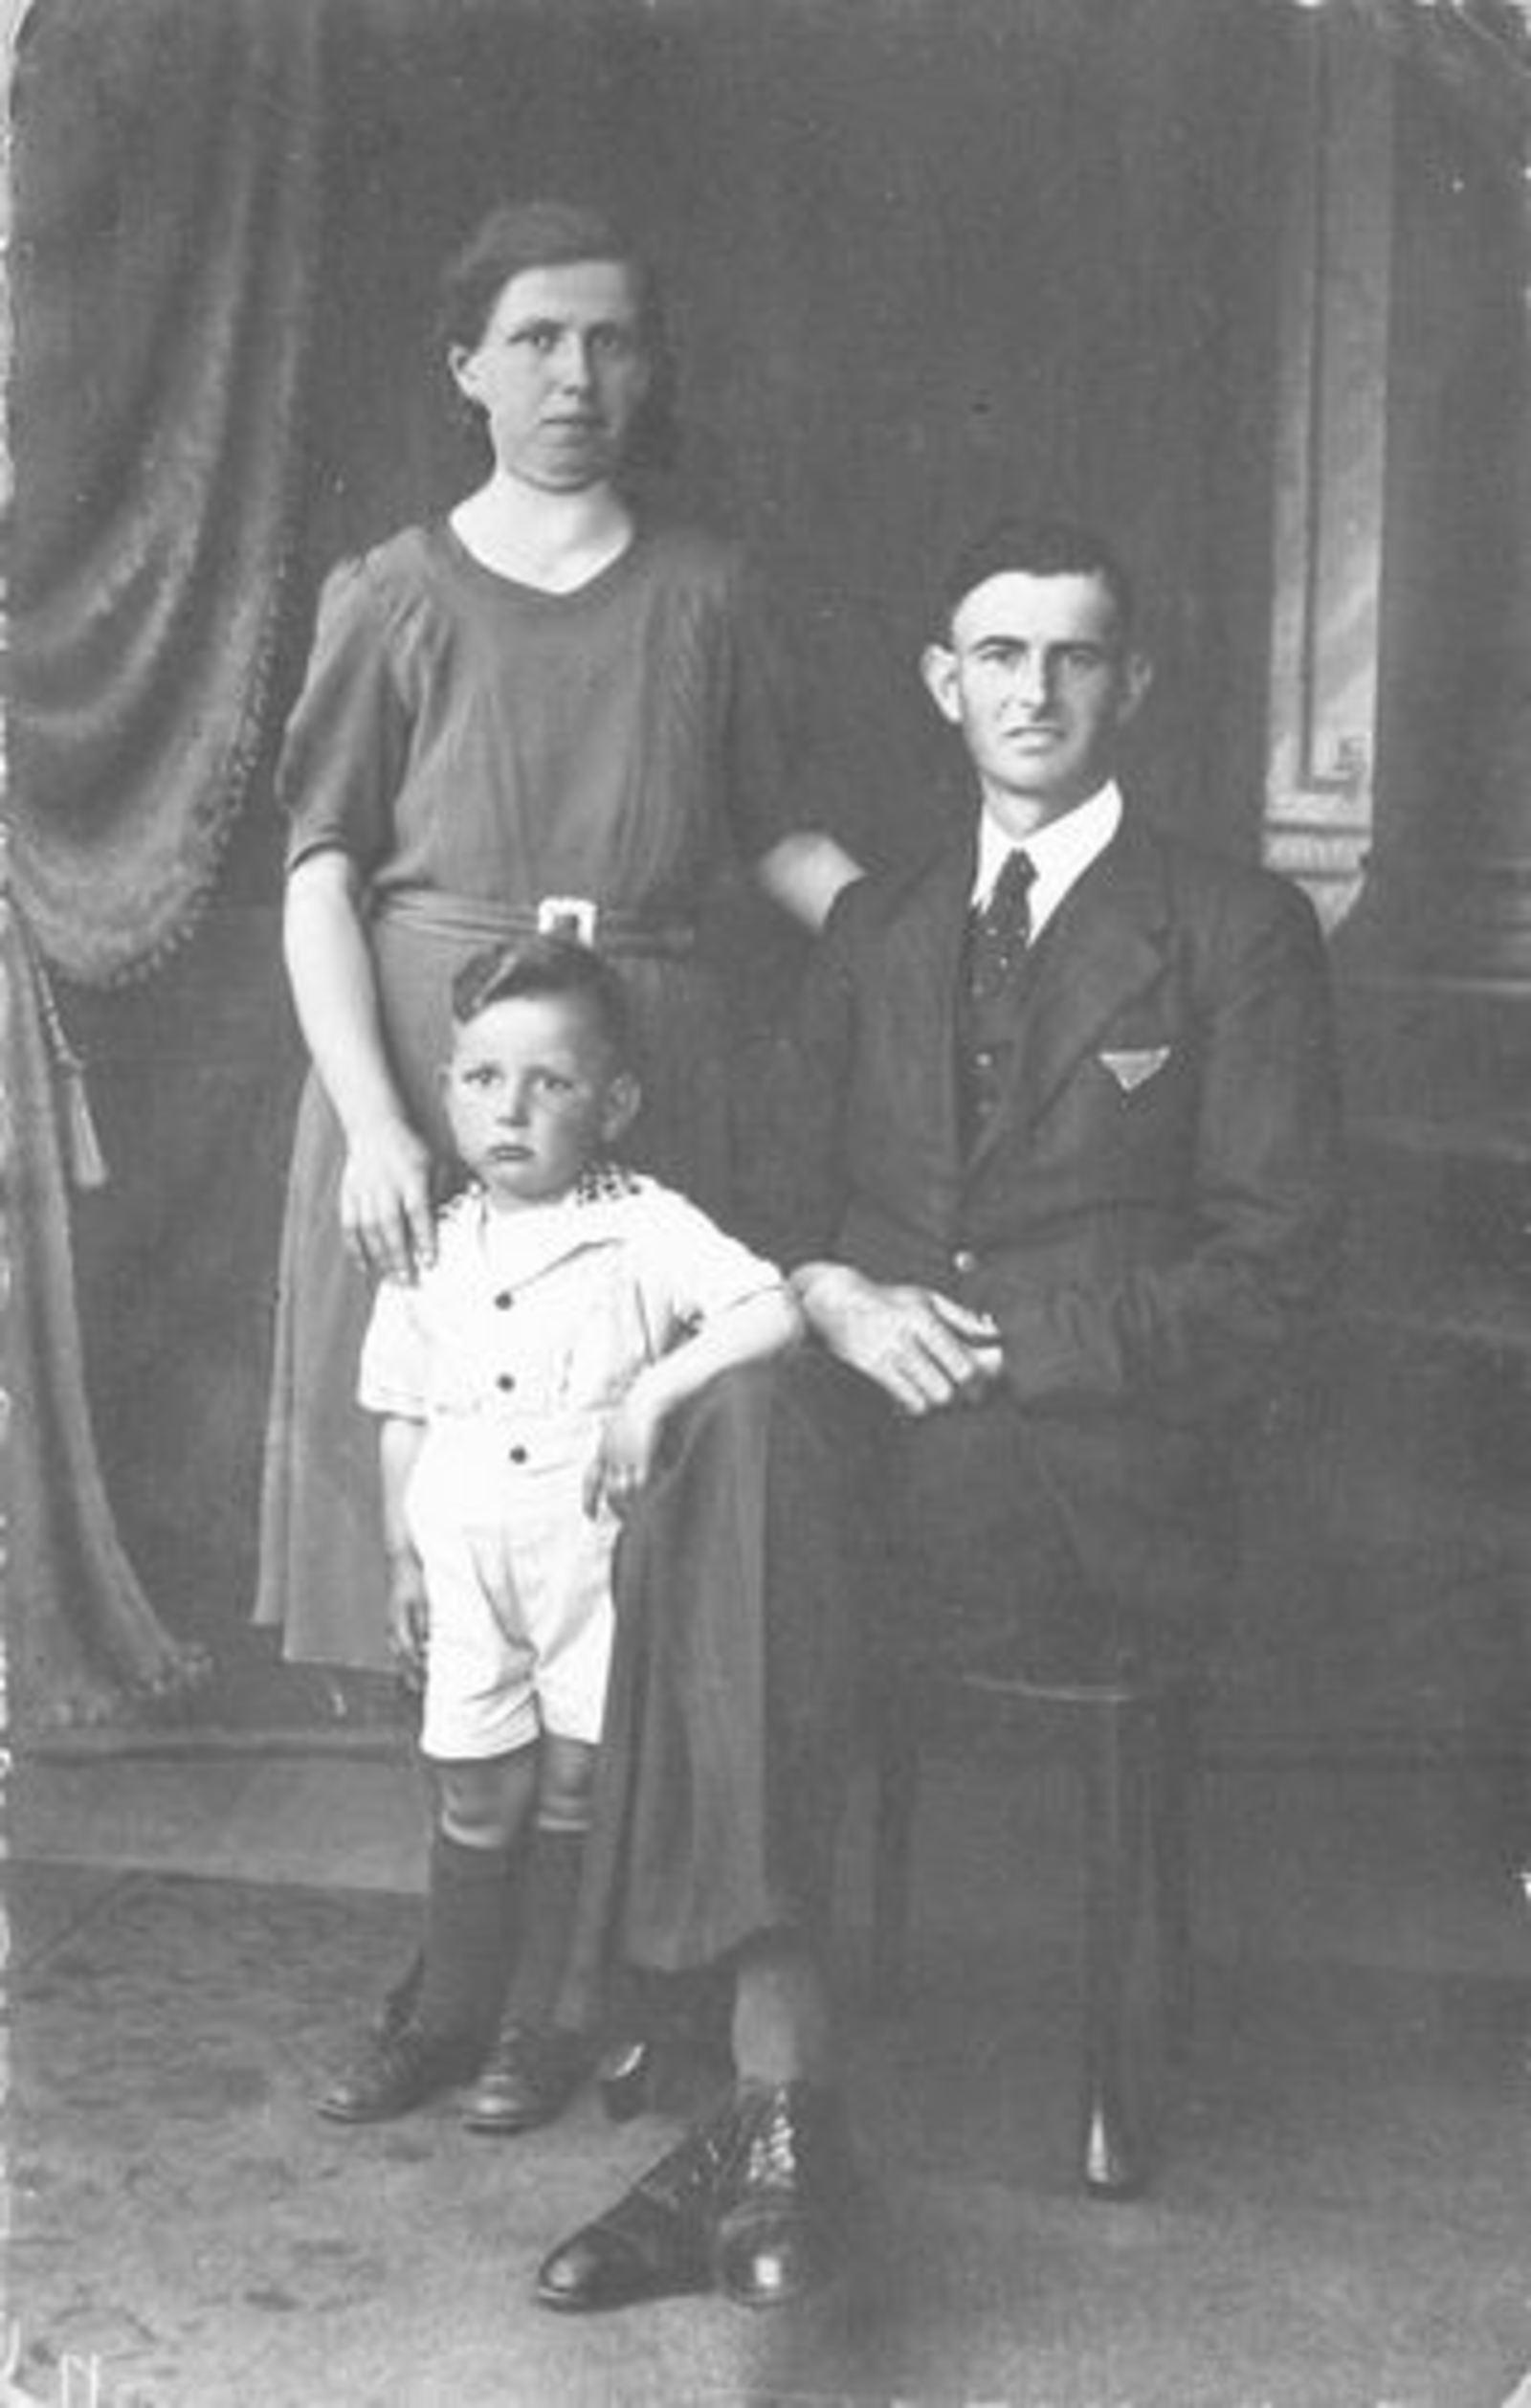 Stroomer Aafje 1912 1940 bij Fotograaf met man Roel Hoogeboom